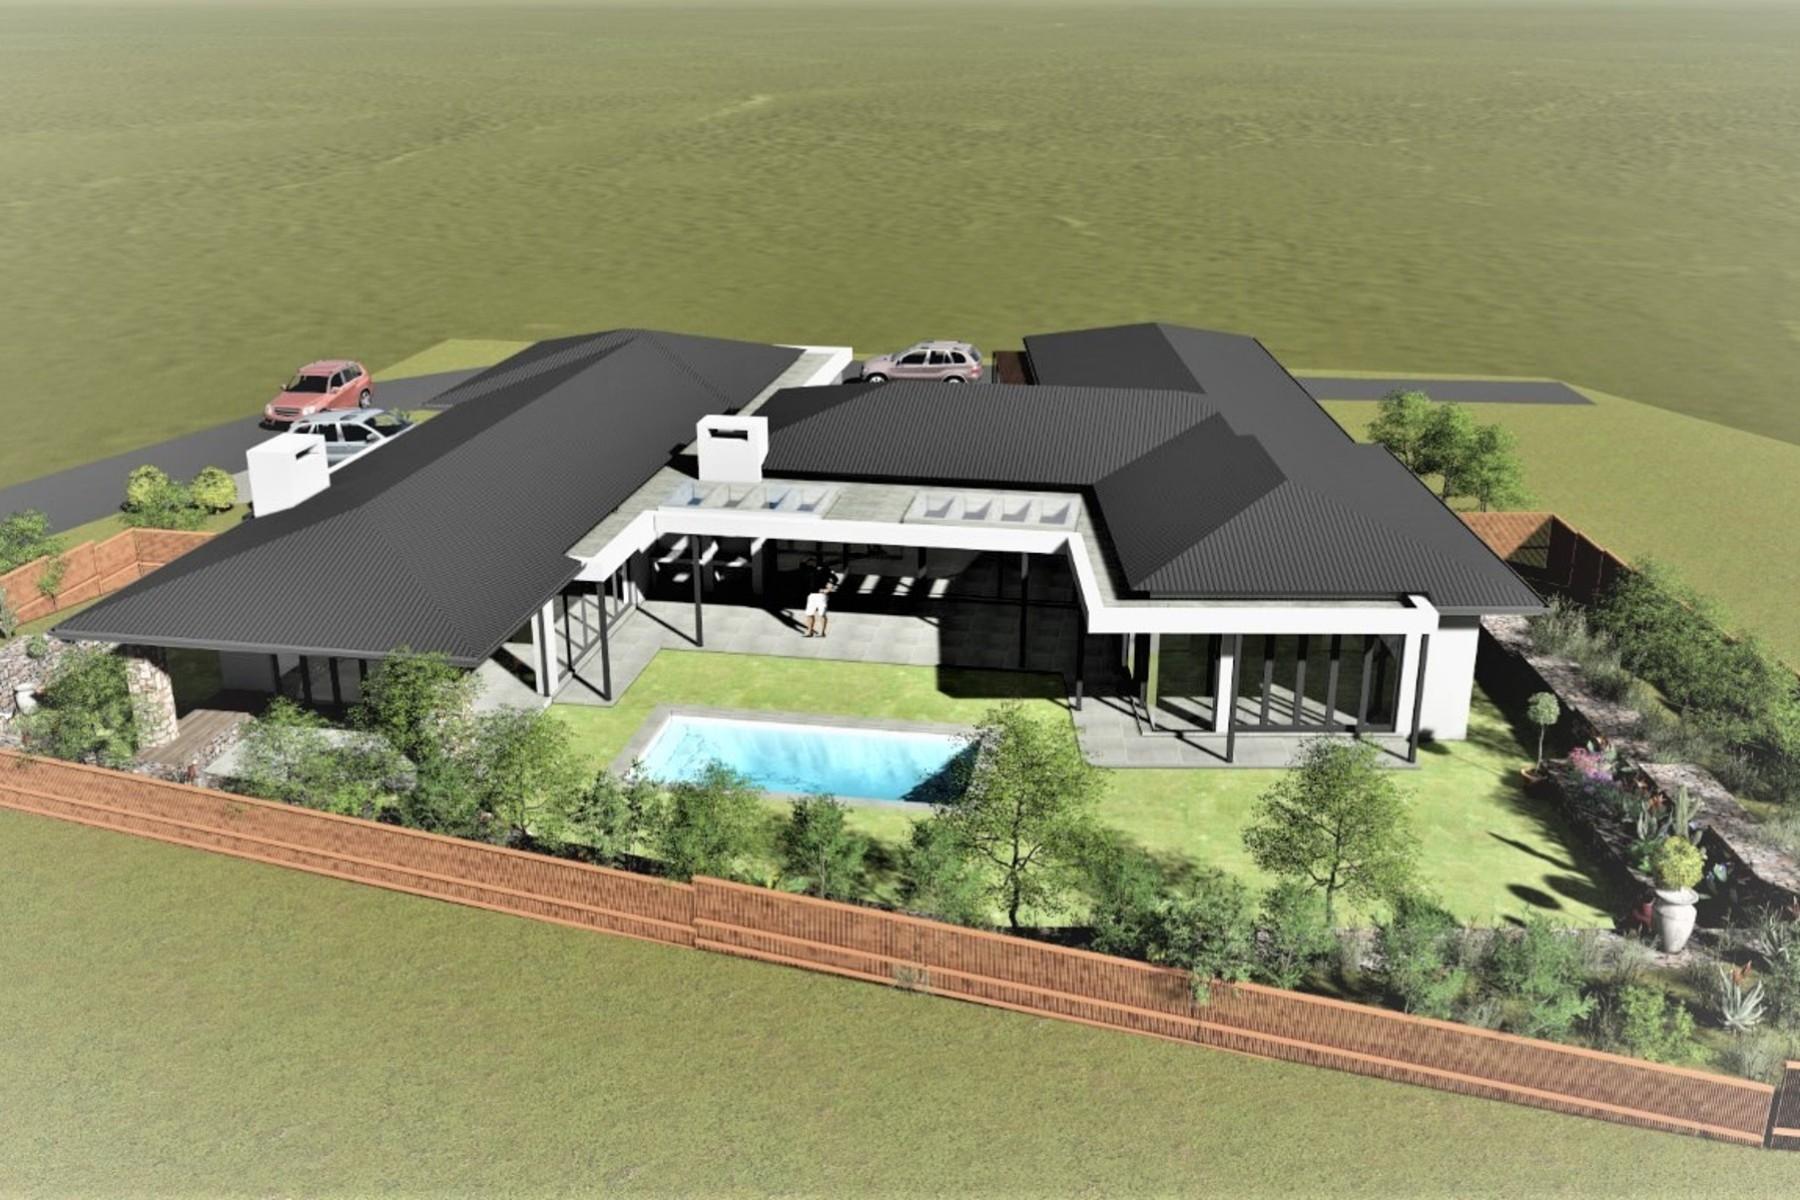 Moradia para Venda às Brand New Home in Whale Rock Ridge 9990 Whale Rock Ridge, Plettenberg Bay, Western Cape, 6600 África Do Sul